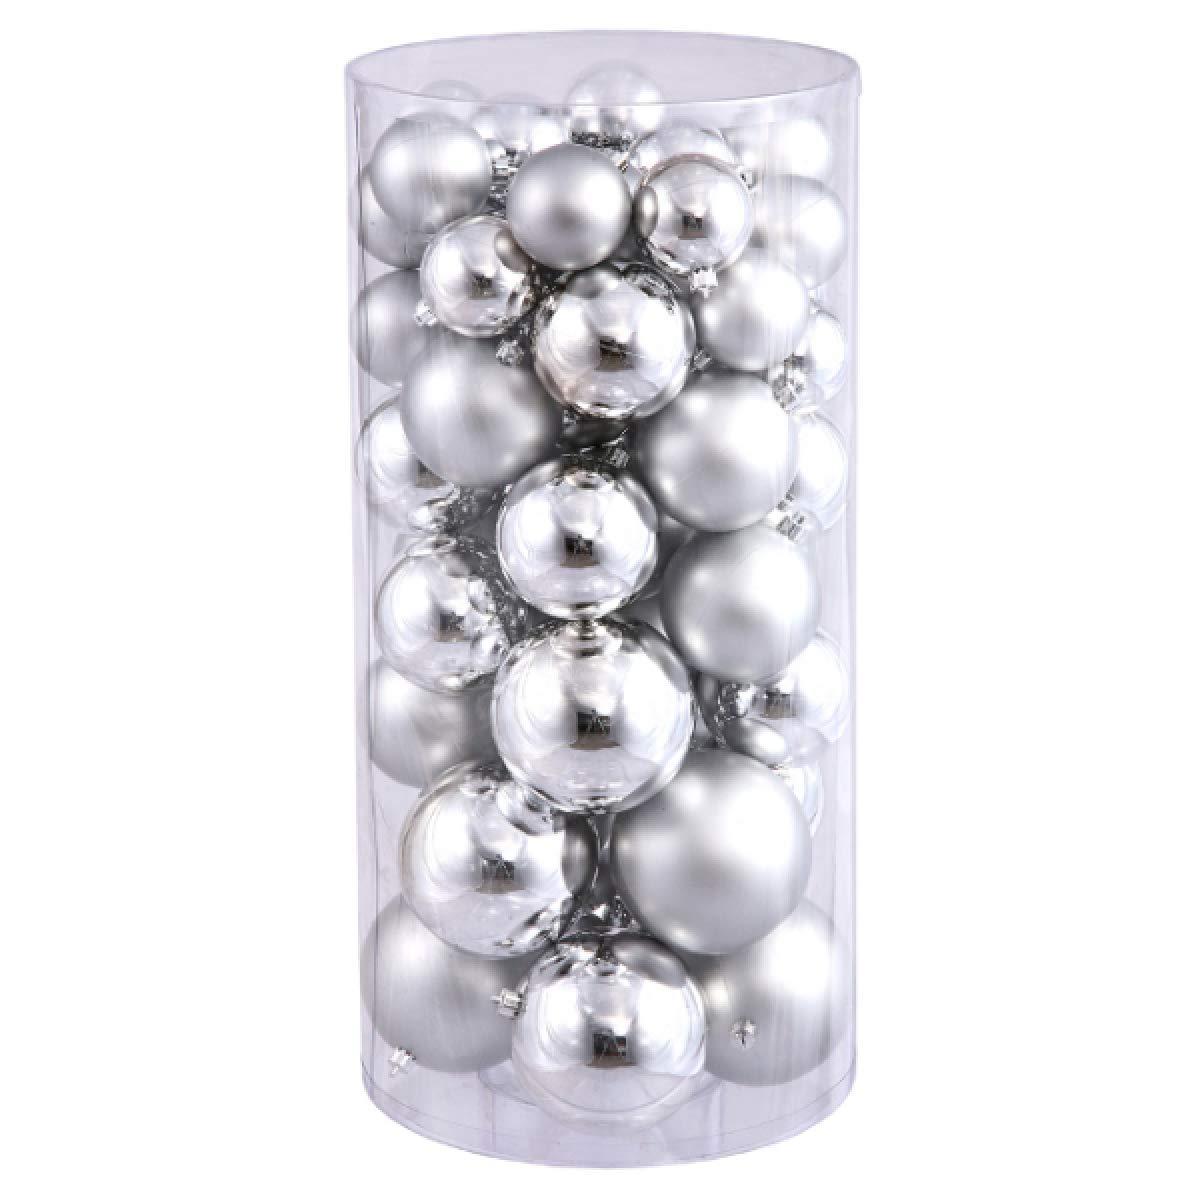 FLAMINGO_STORE Christmas Ball Ornament Silver Splendor Shatterproof Shiny and Matte Christmas Ball Ornaments 1.5''-2'' 50ct Silver Splendor Shatterproof Shiny and Matte Christmas Ball Ornaments 1.5''-2''